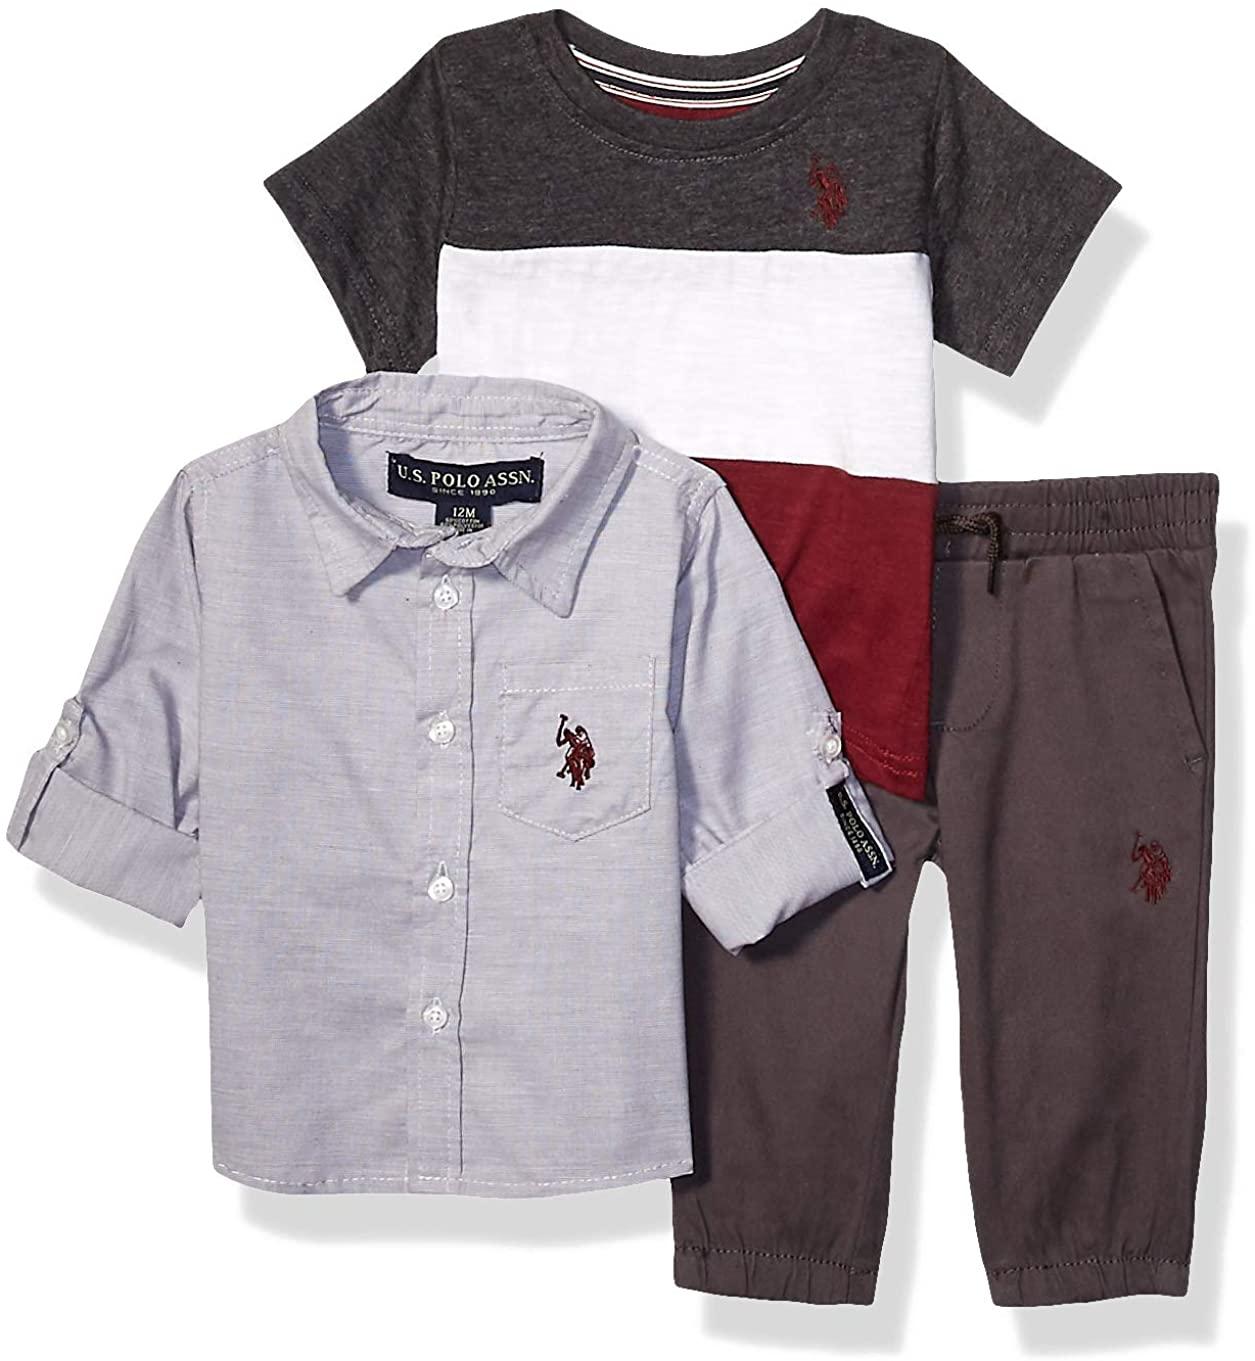 U.S. Polo Assn. Baby Boys Long Sleeve Woven Shirt, Color Block T-Shirt, and Jogger Set Pants